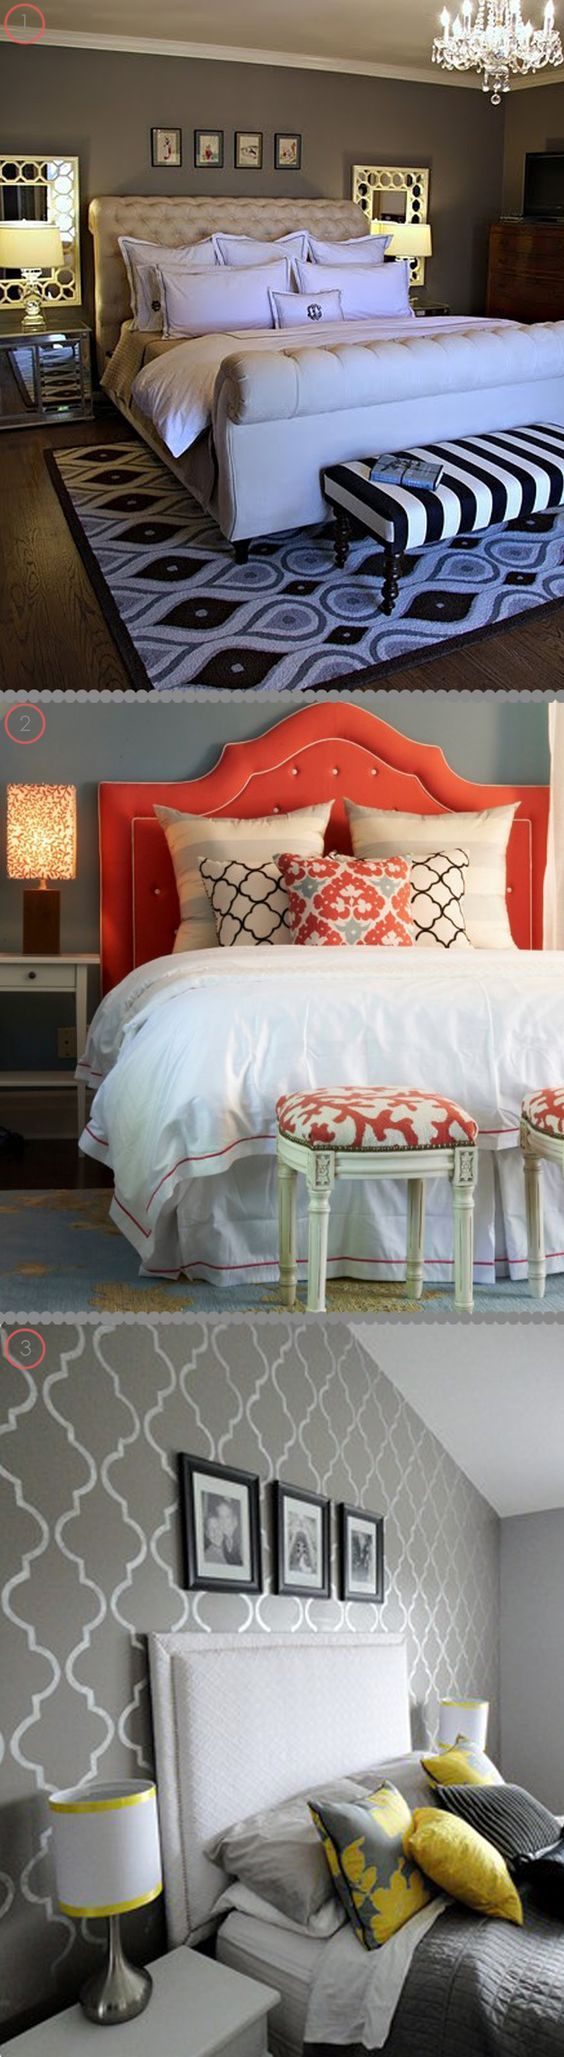 0771dcefcf283d42721f85089718a552  grey orange bedroom coral bedroom Best Of Blaugrünes Und Graues Schlafzimmer Zat3